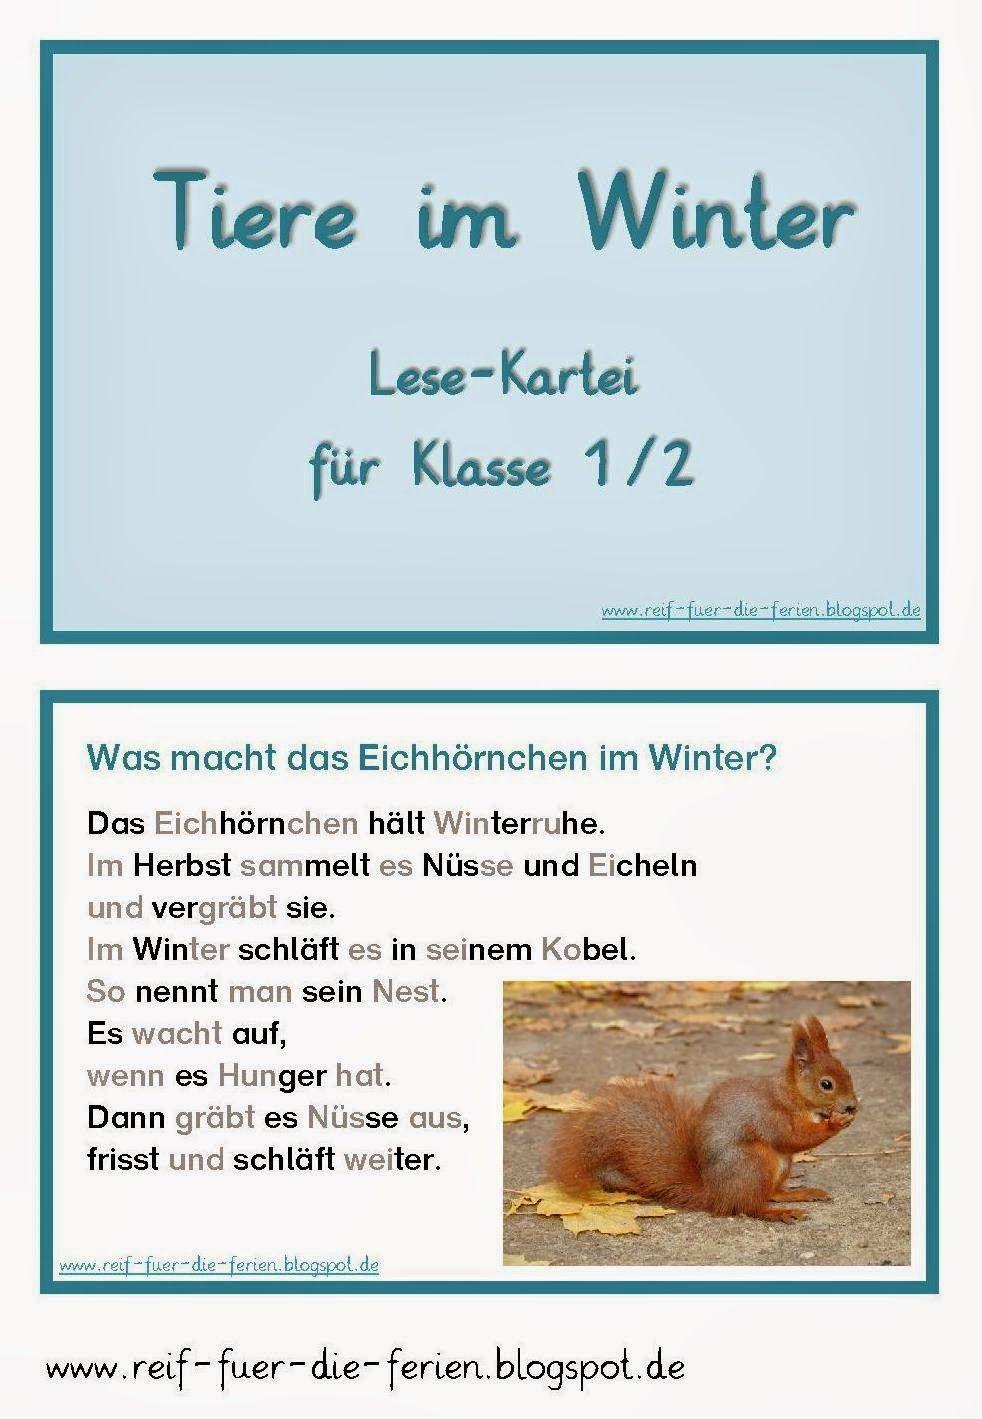 Tiere Im Winter Lesekartei Reif Fur Die Ferien Wald Grundschule Kartei